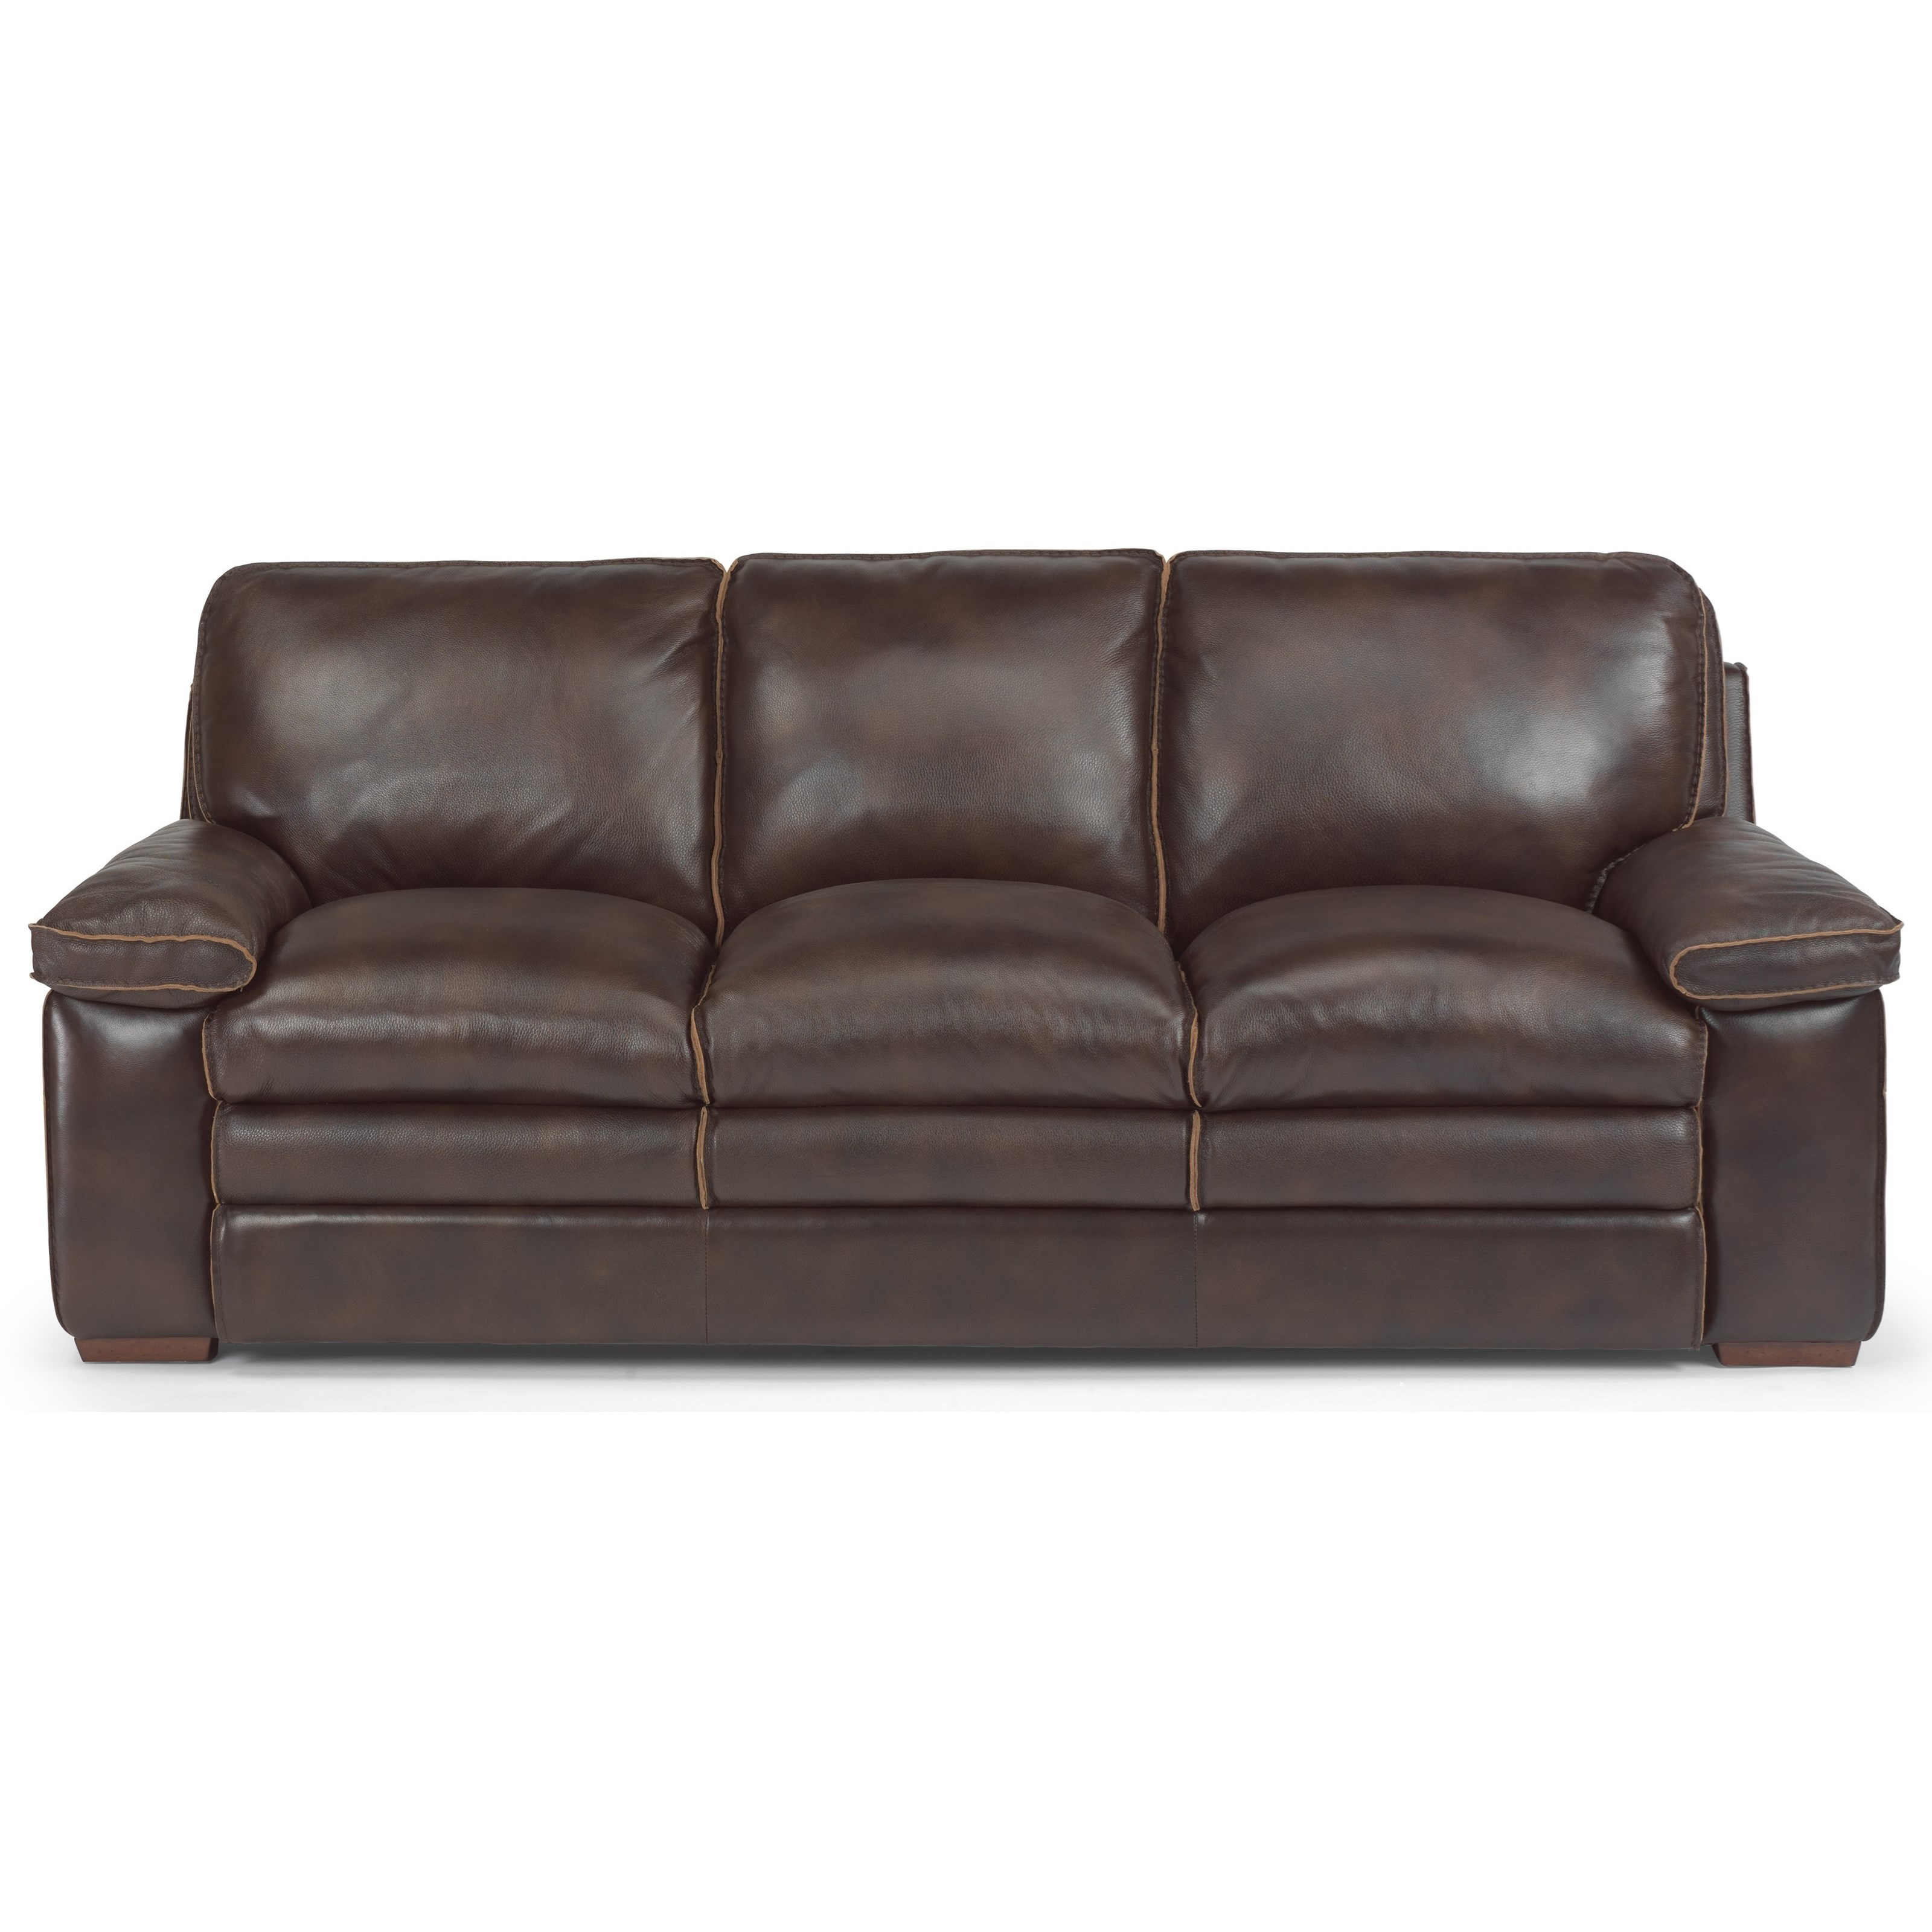 flexsteel latitudes penthouse casual sofa with pillow top seating rh furnituremartco com